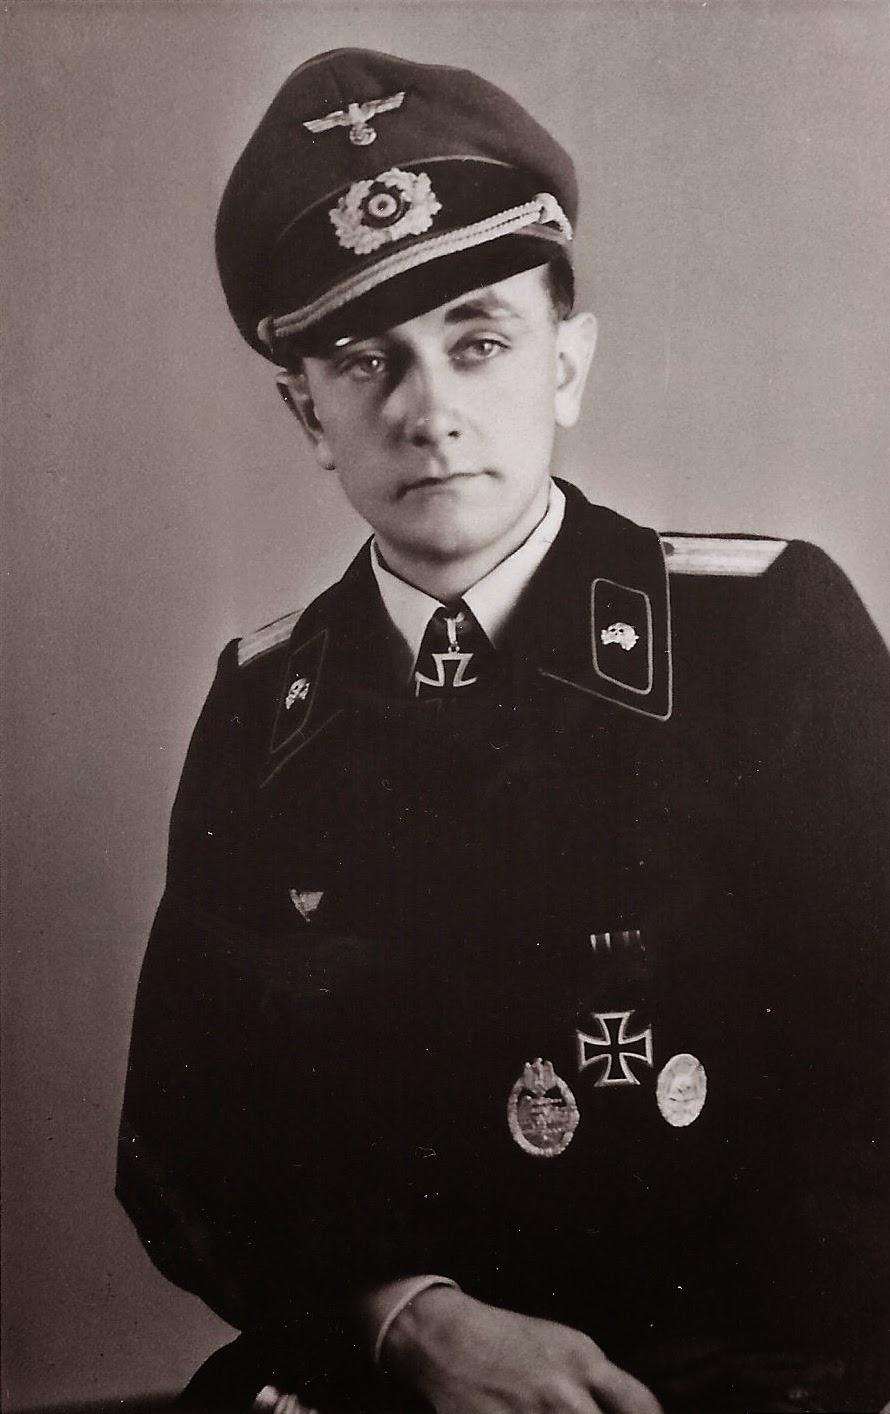 nazi jerman oberleutnant der reserve otto carius 1922